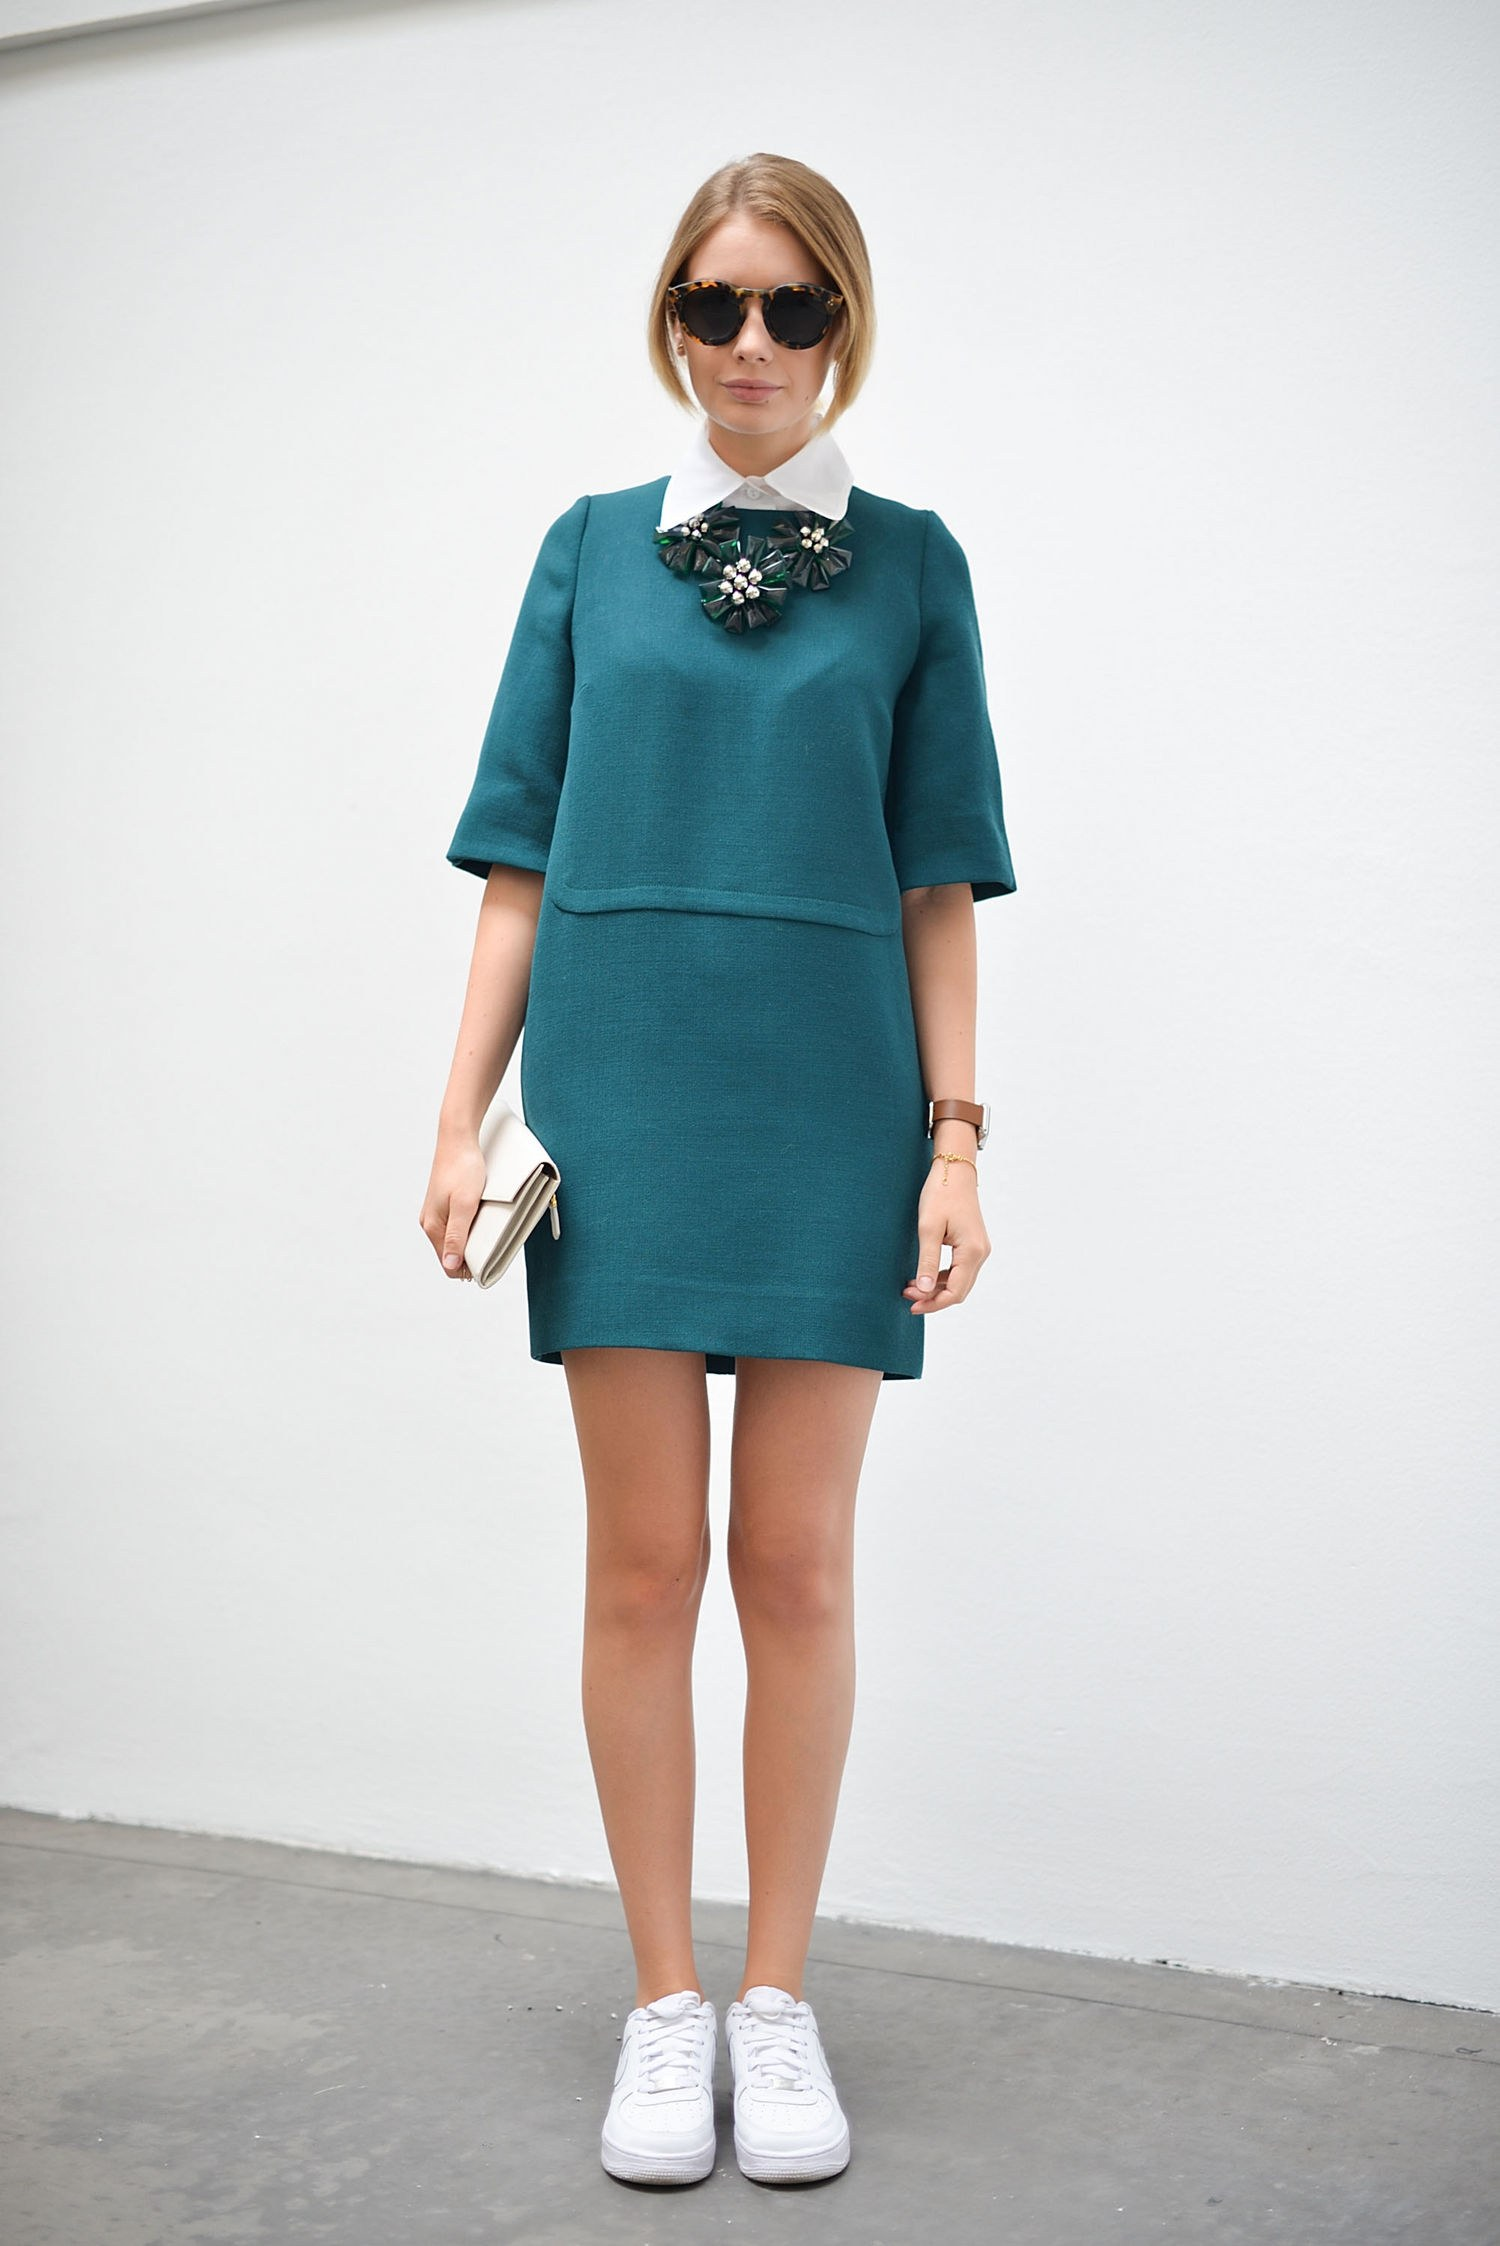 1-tunic-dress-ideas